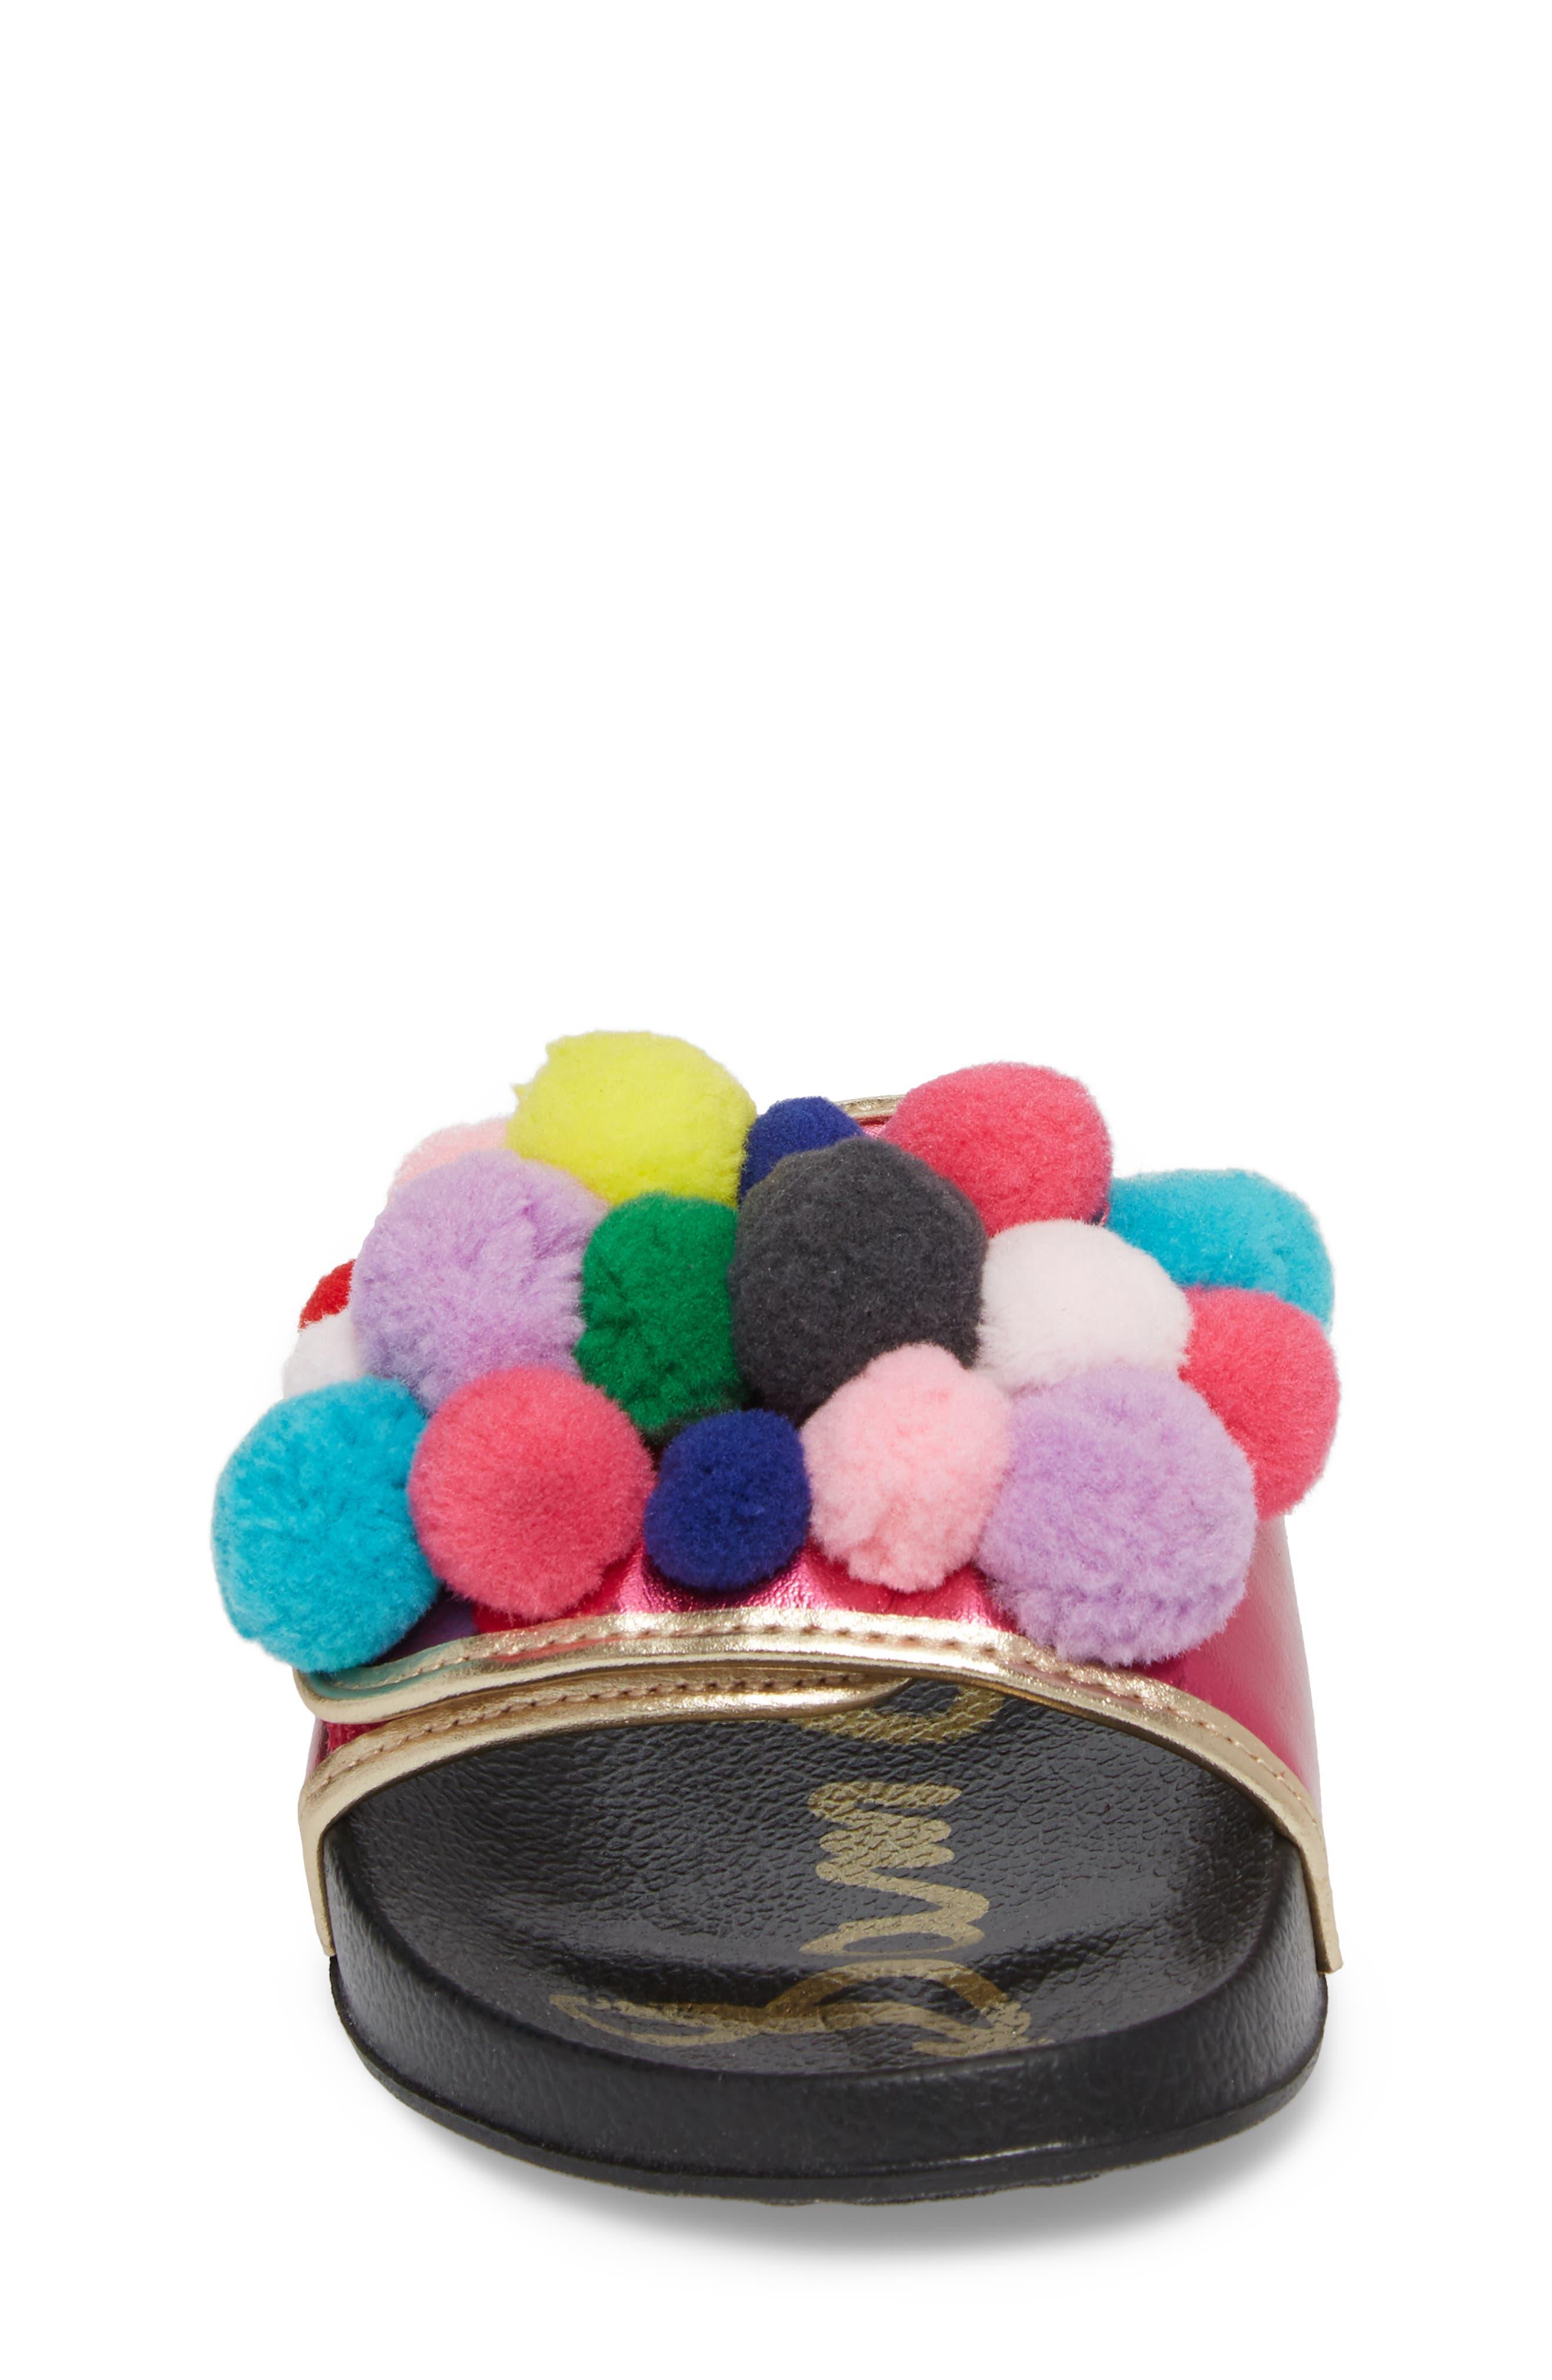 Faux Fur Mackie Cayman Sandal,                             Alternate thumbnail 4, color,                             697